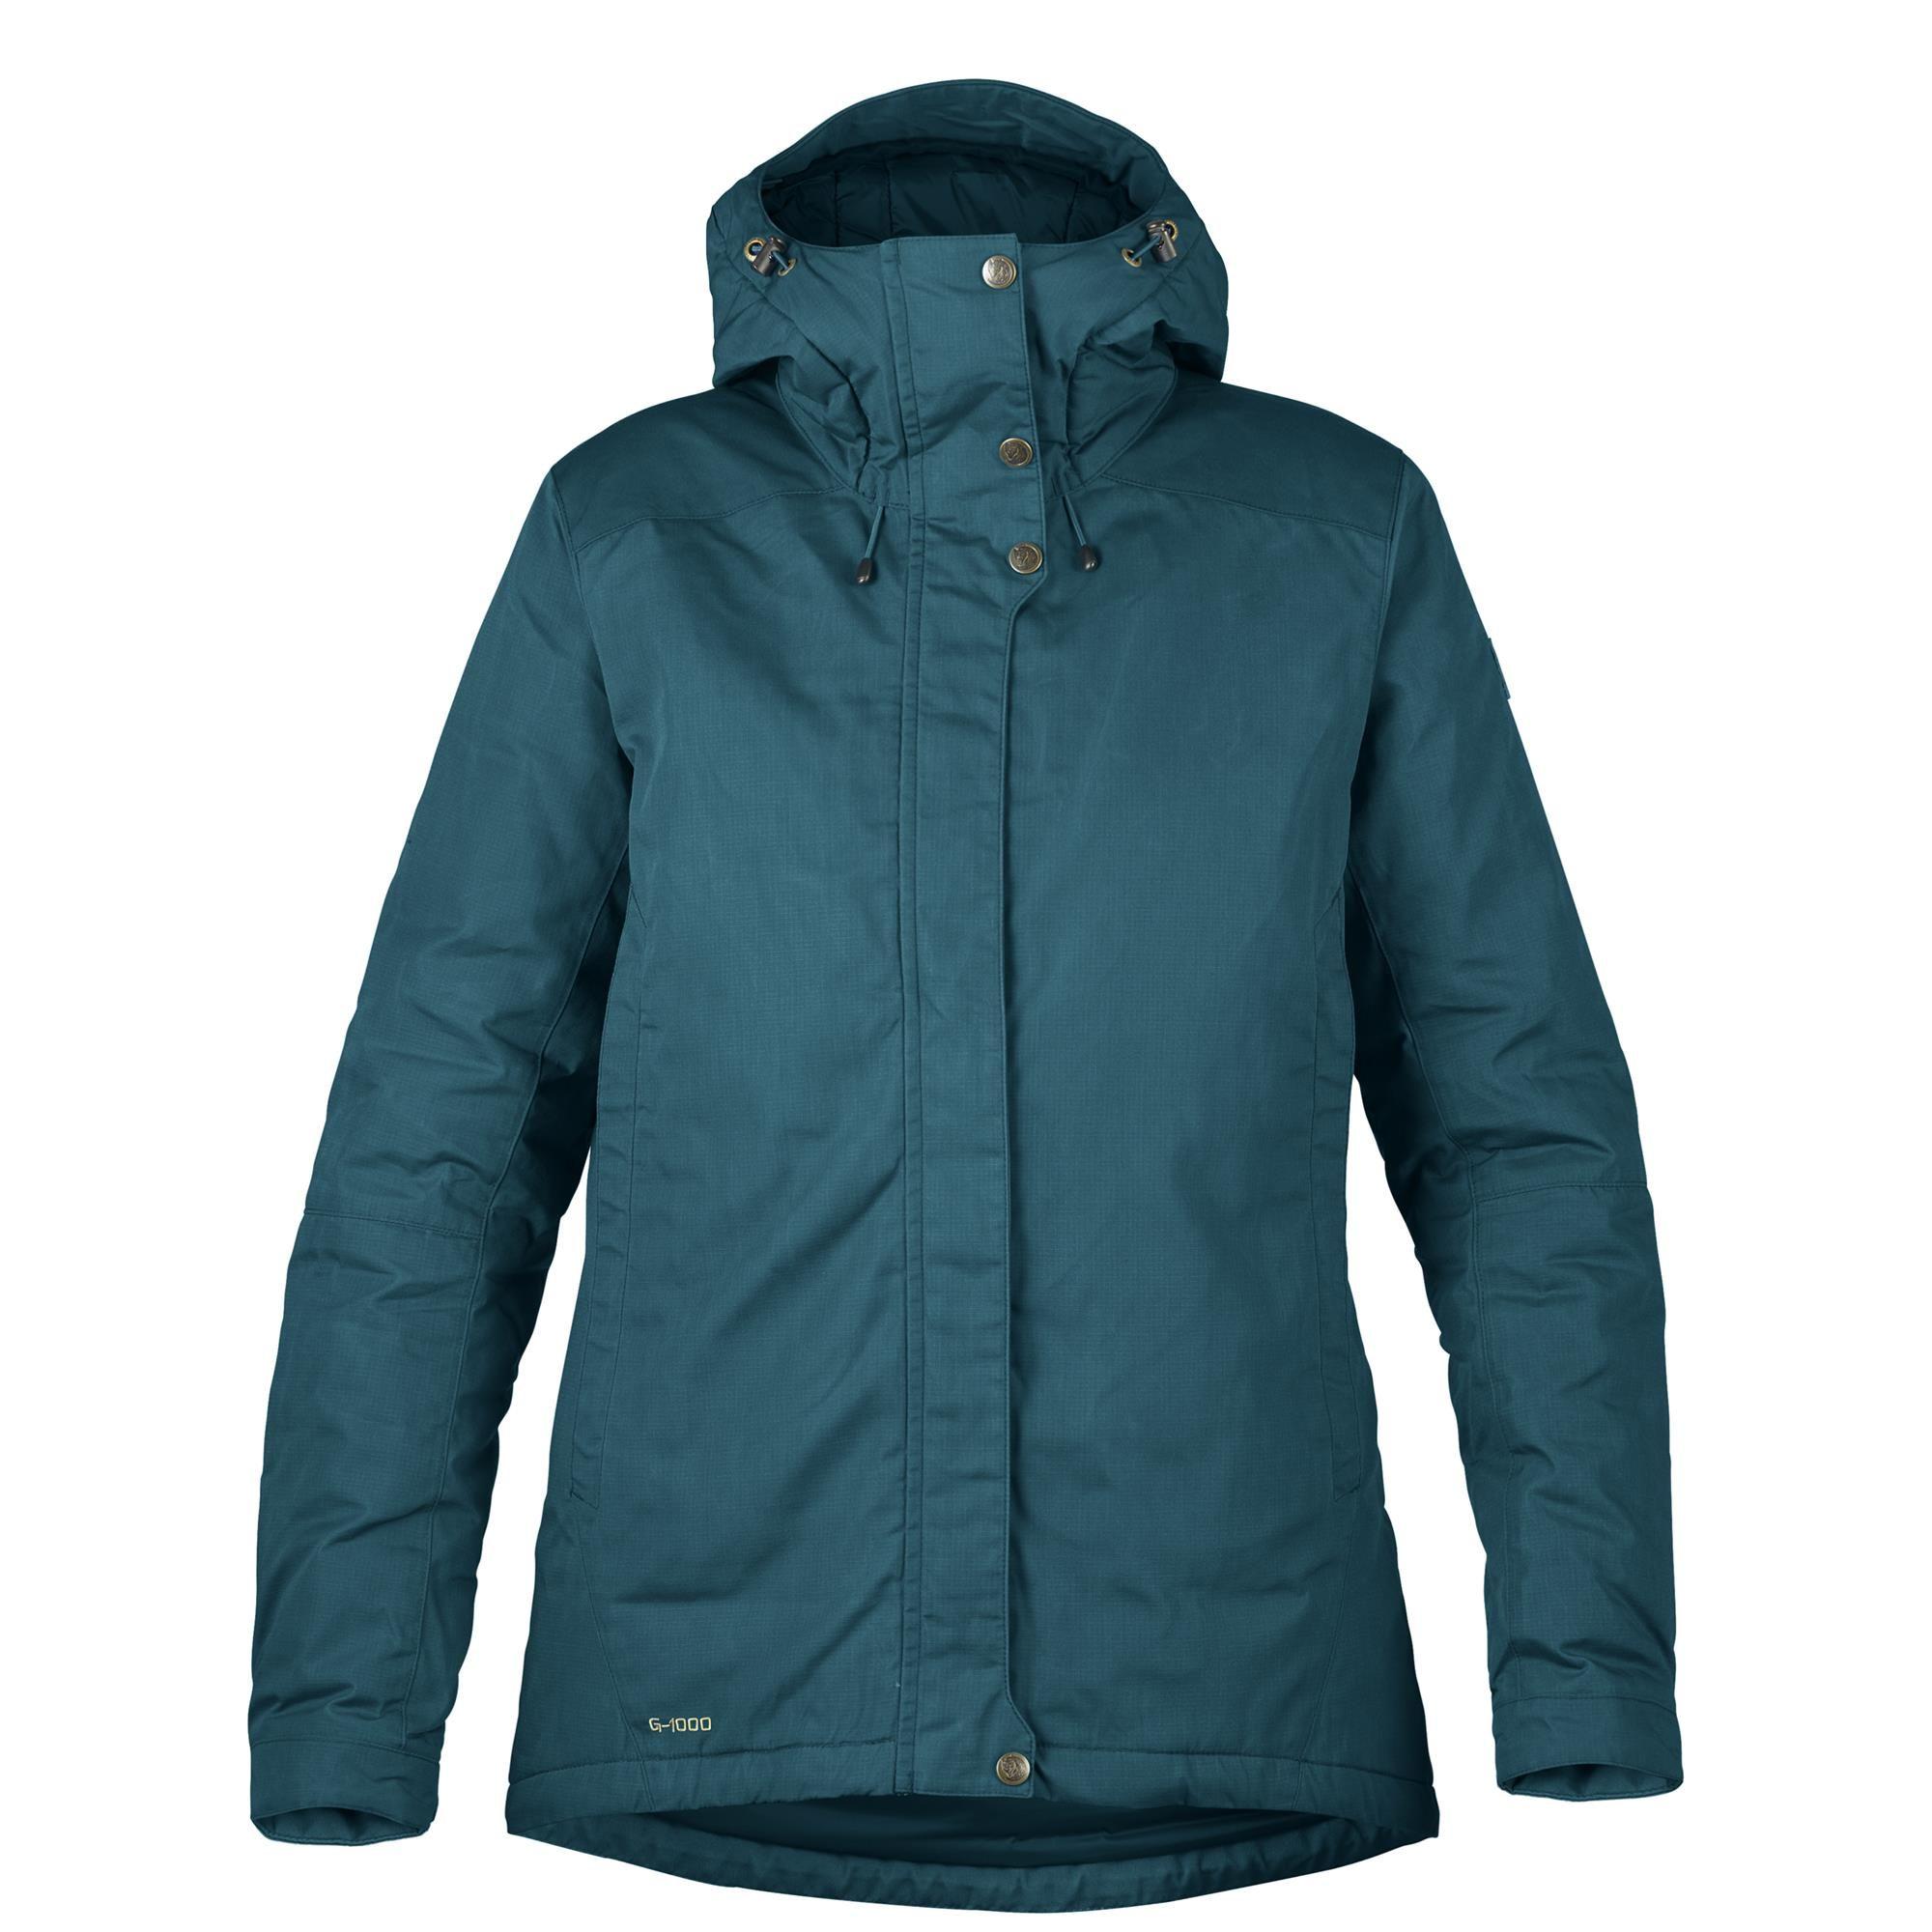 W Xtend Skogsö Jacket Winterjacke Angebote Padded Fjällräven hdsQxtrC